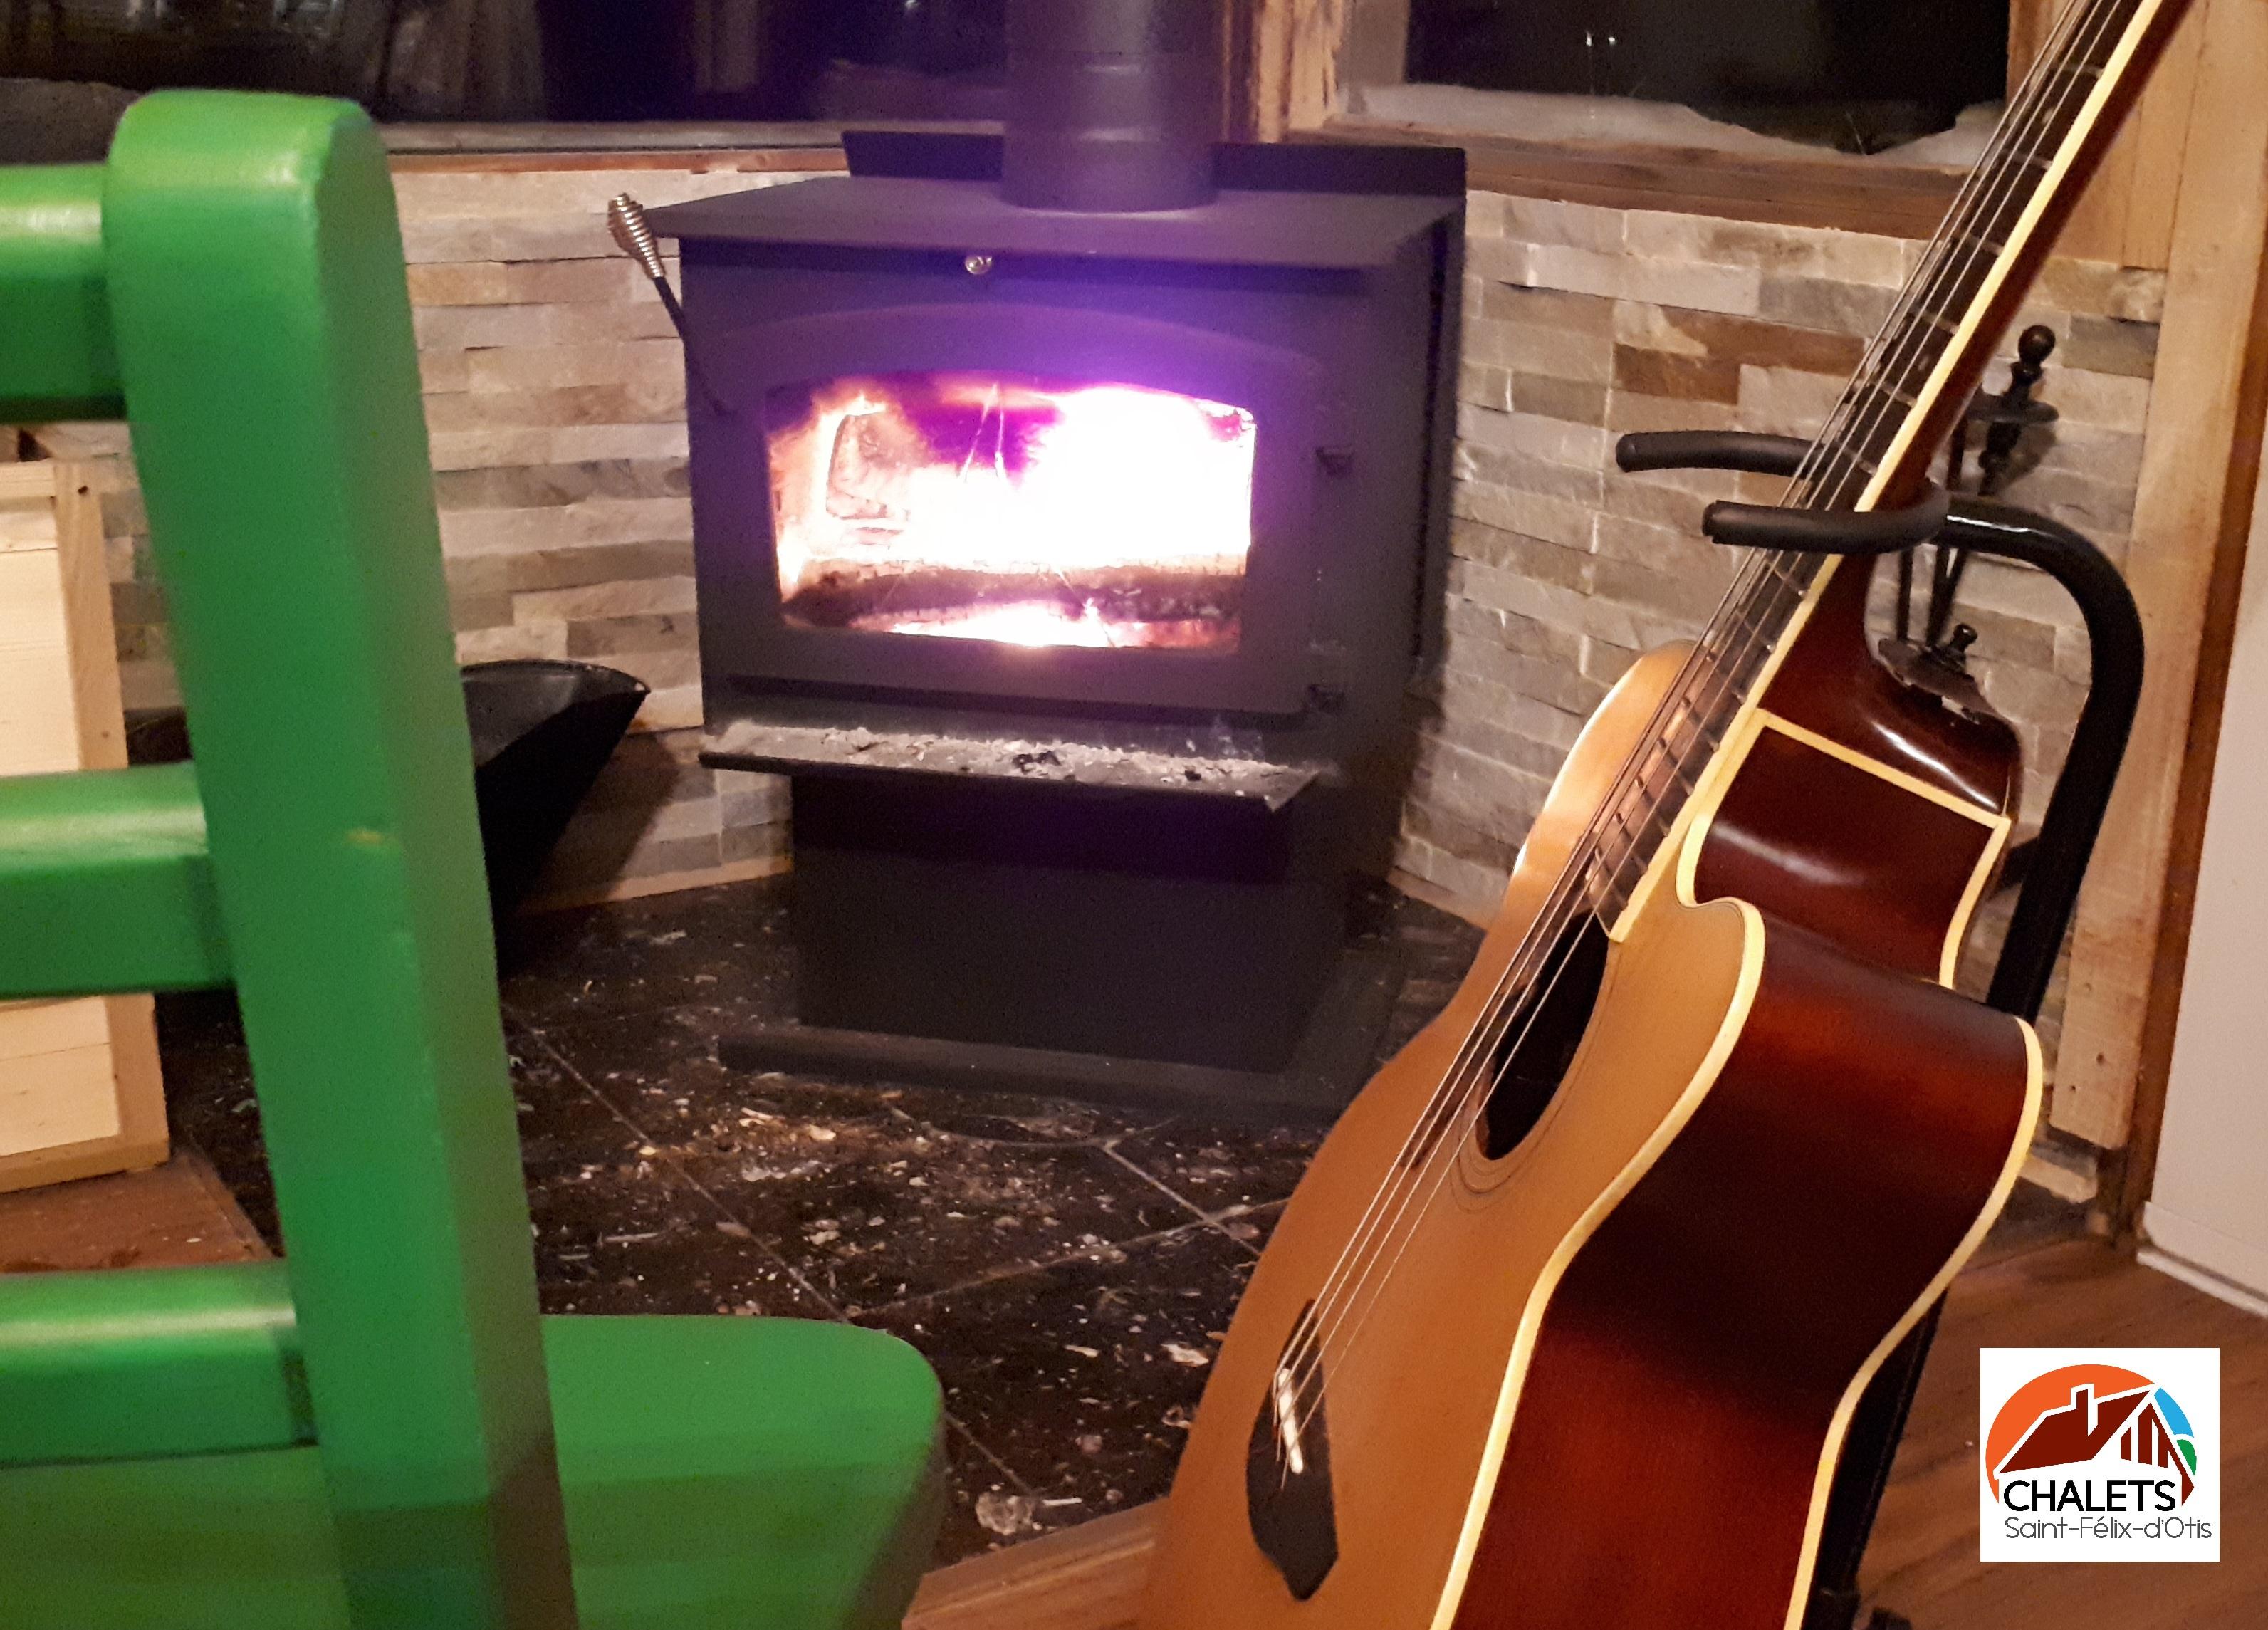 Guitare feu www.chaletssaintfelixdotis